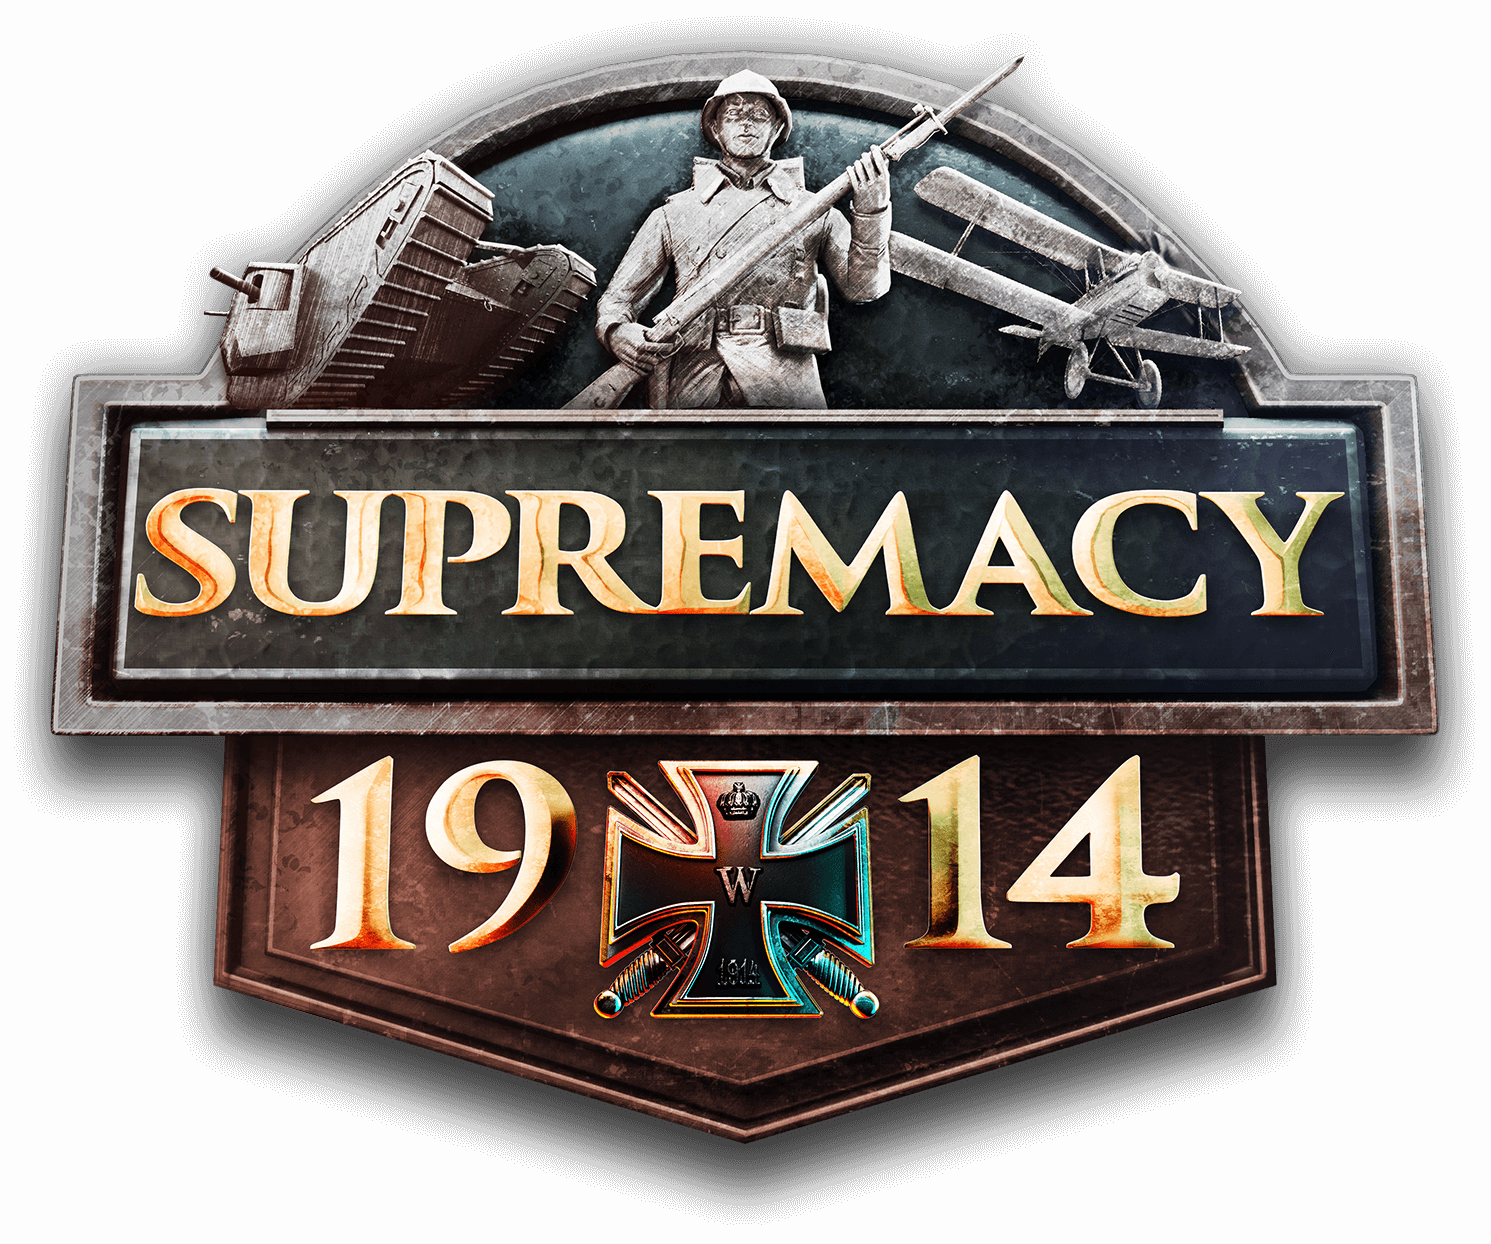 1914 Supremacy